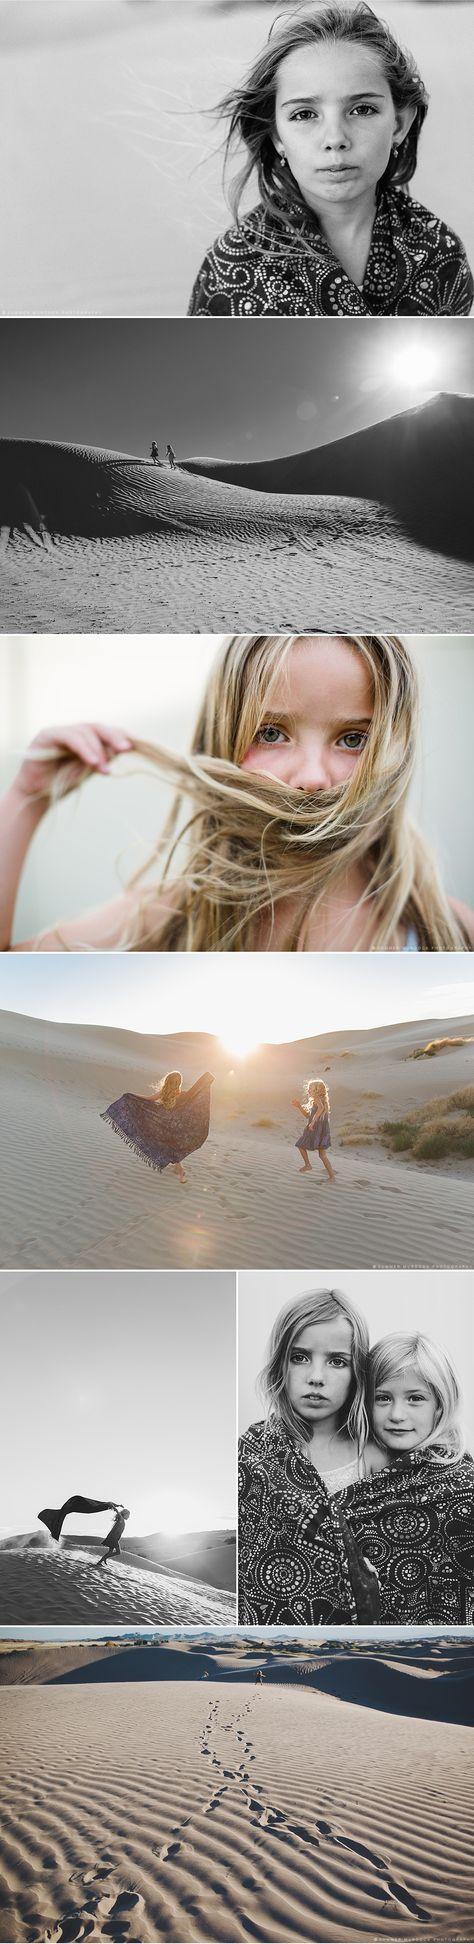 Summer Murdock Photography Salt Lake City Photographer Desert Sand Dunes